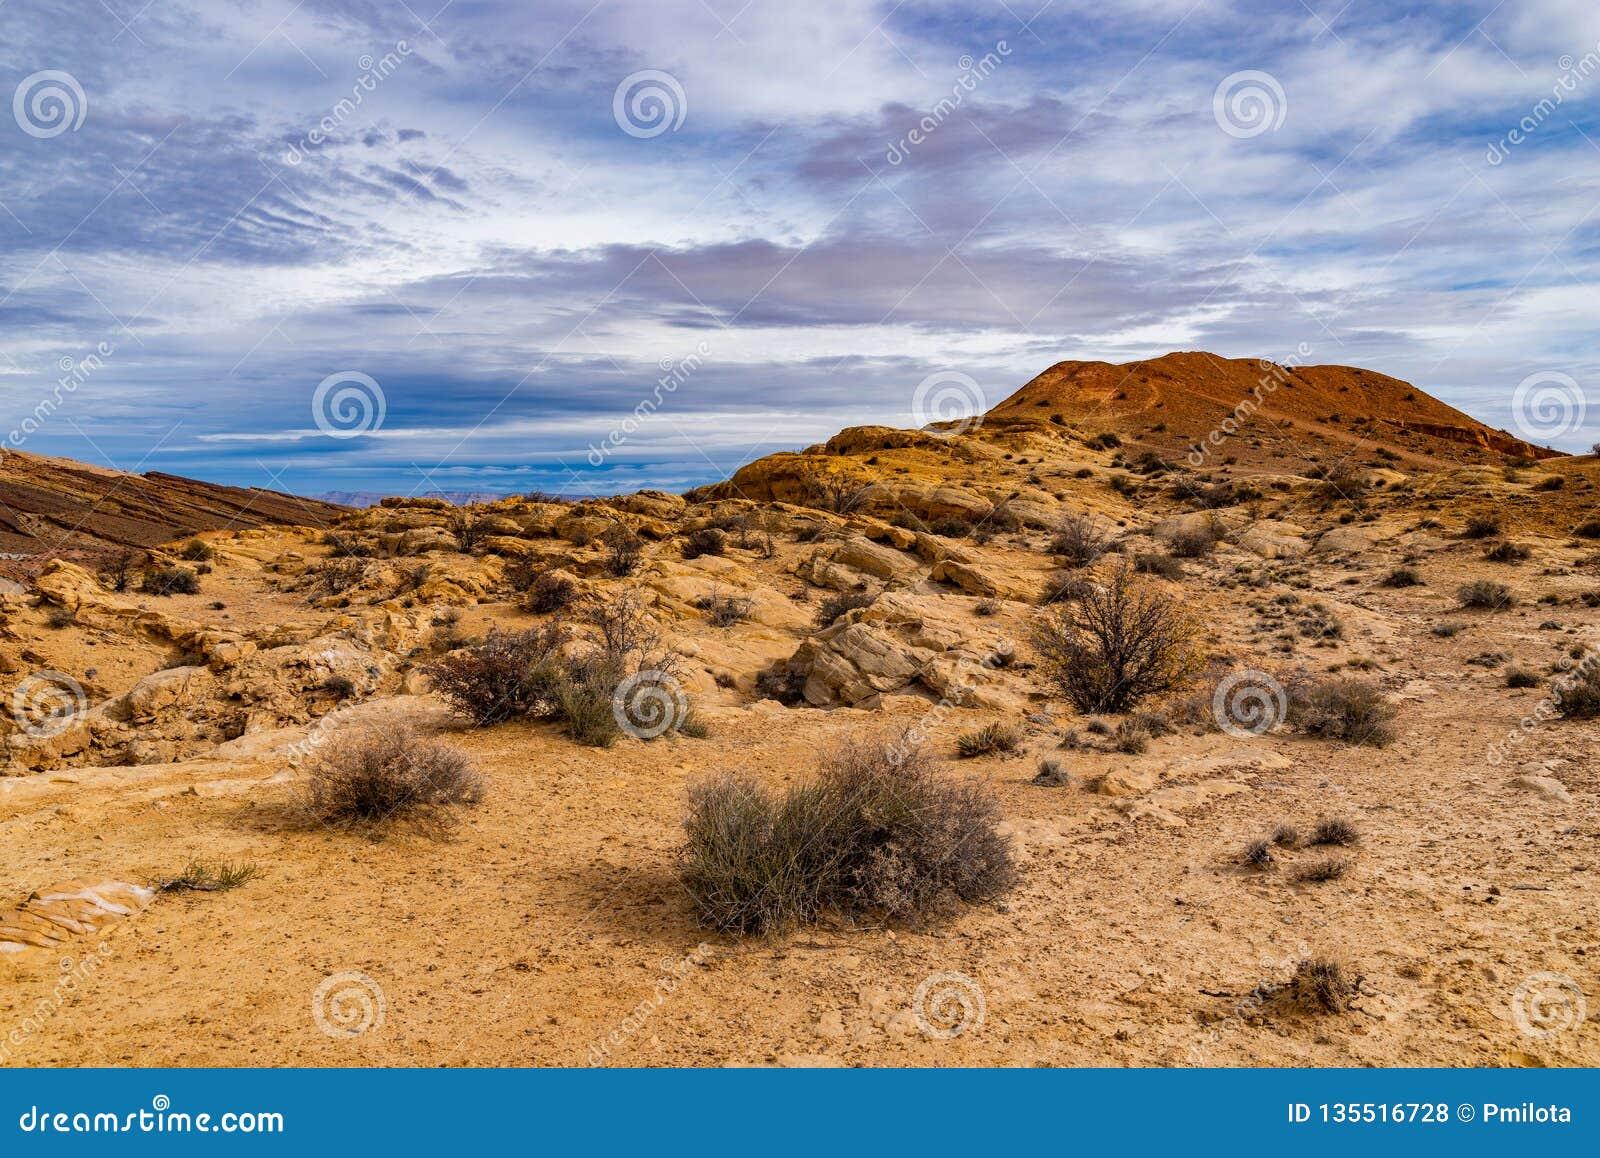 Следы пустыни пустыни Юты